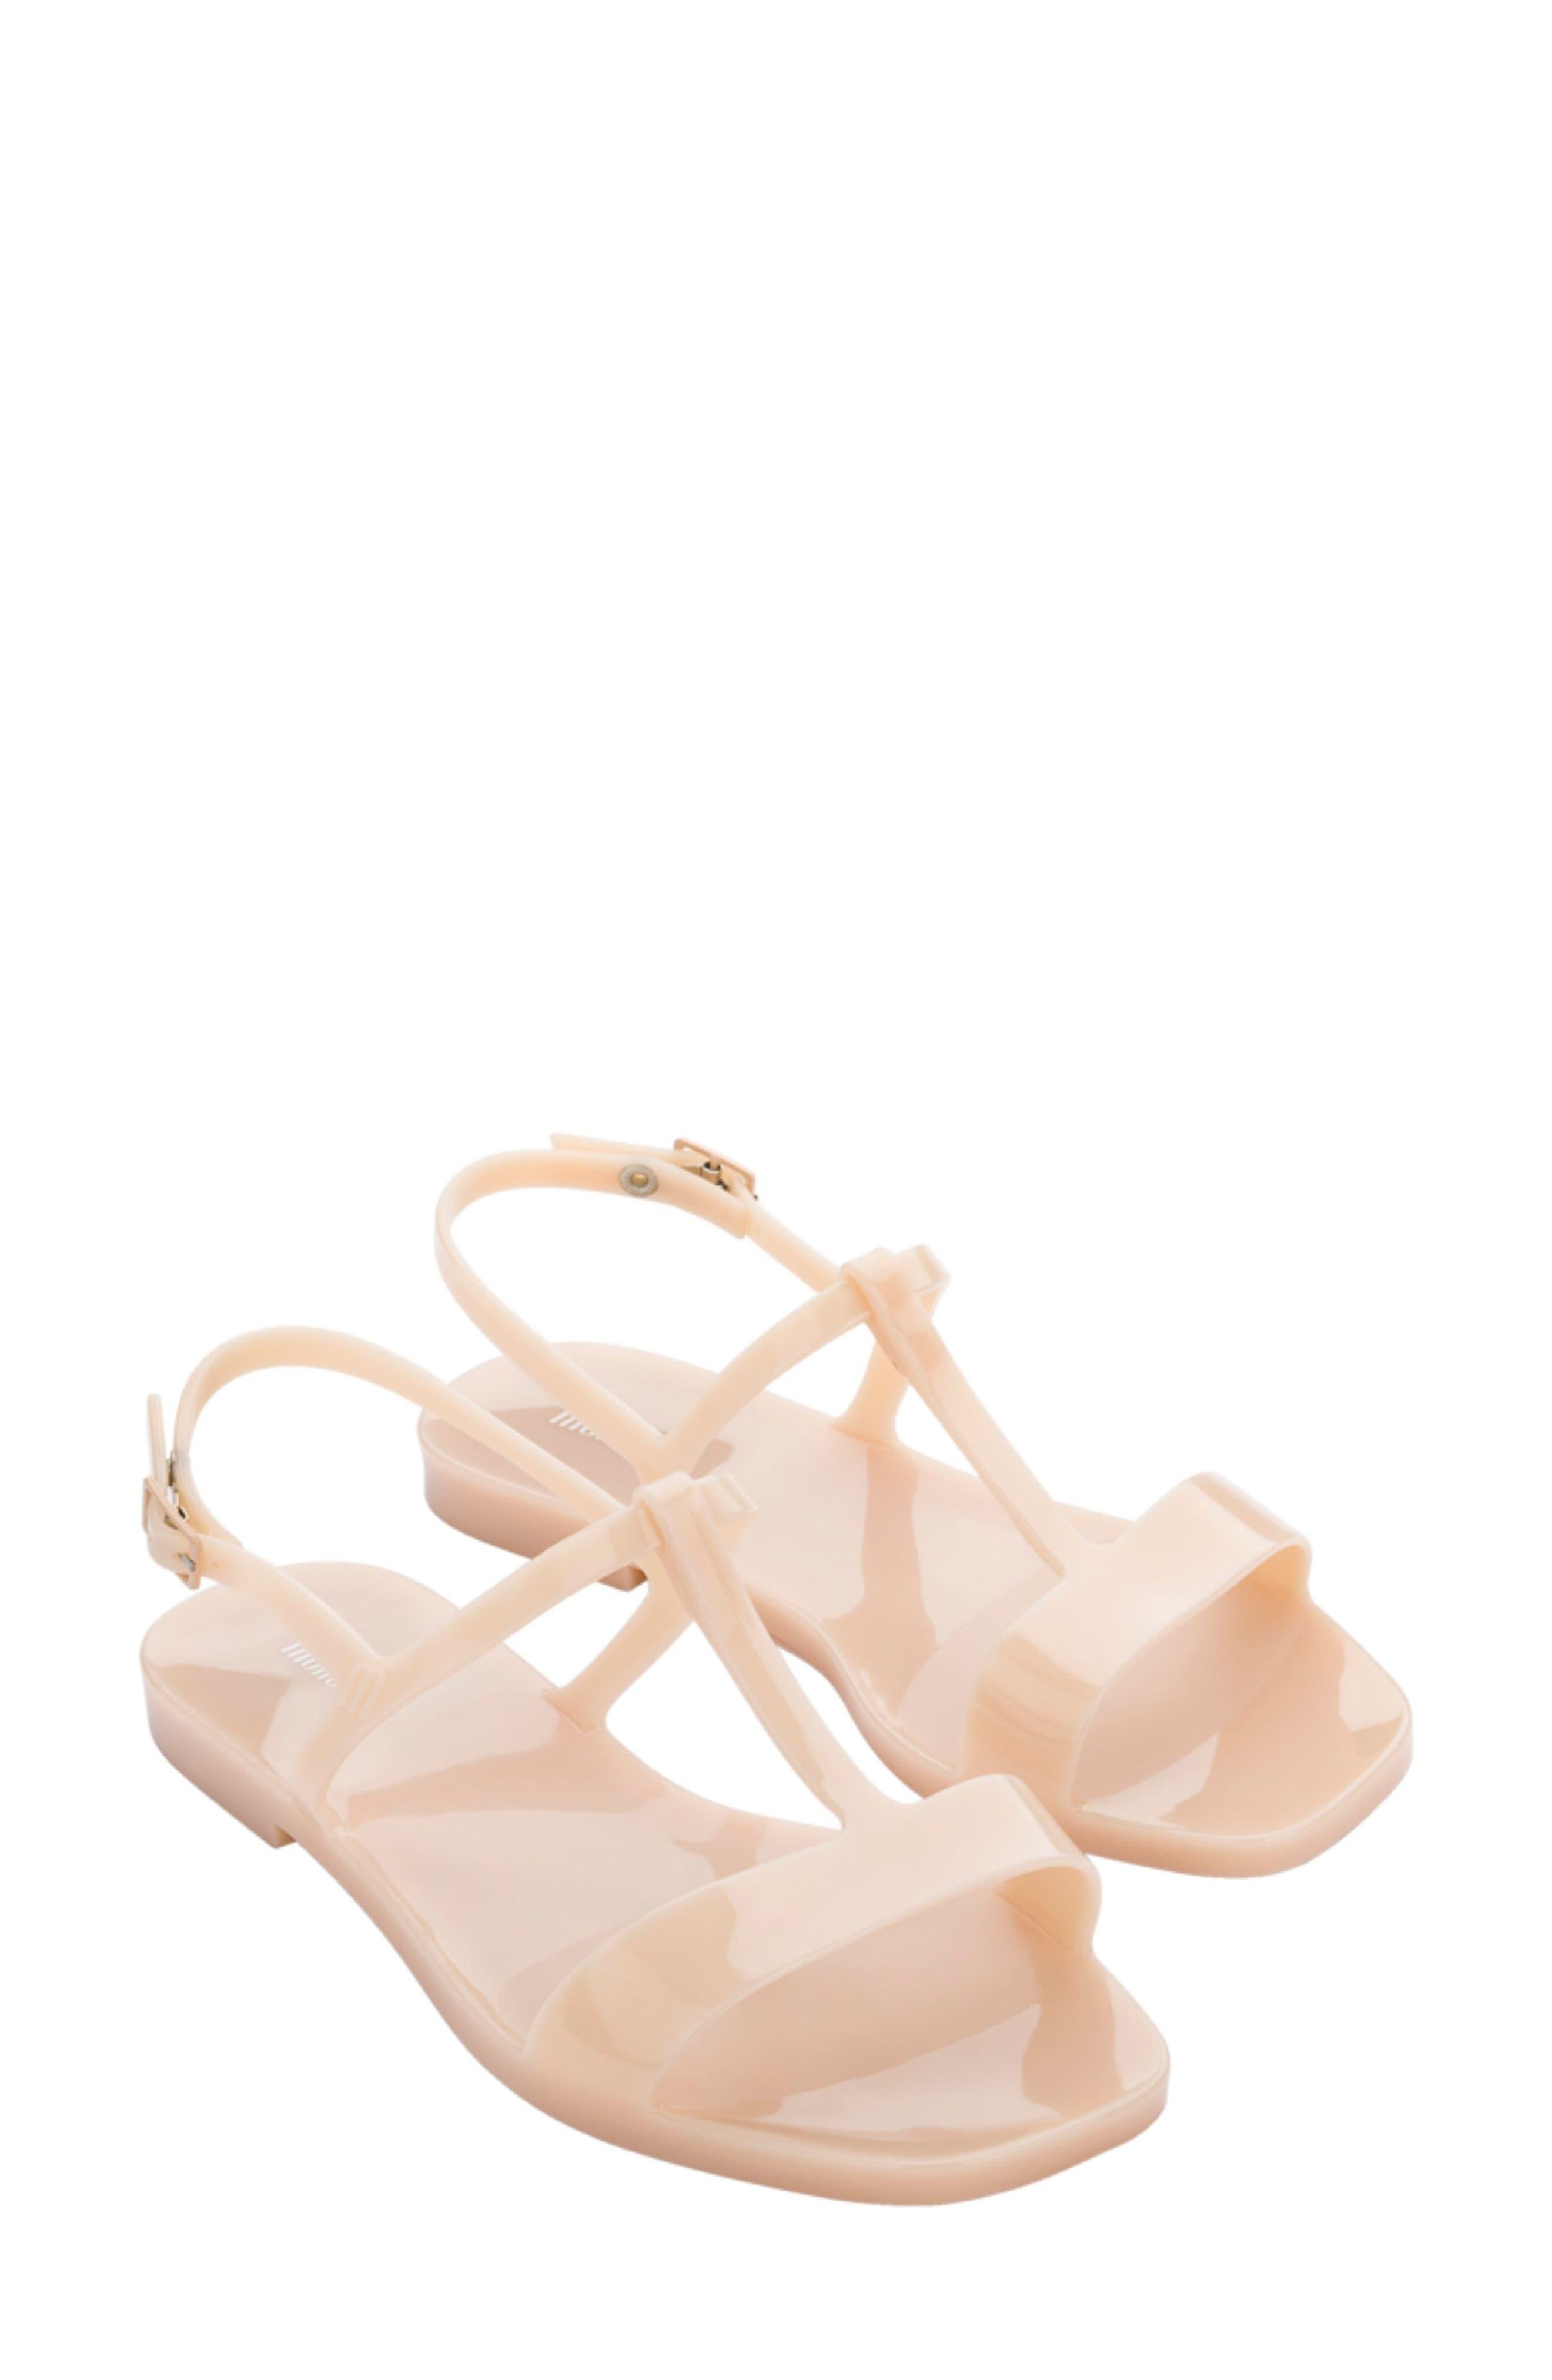 Essential New Sandal